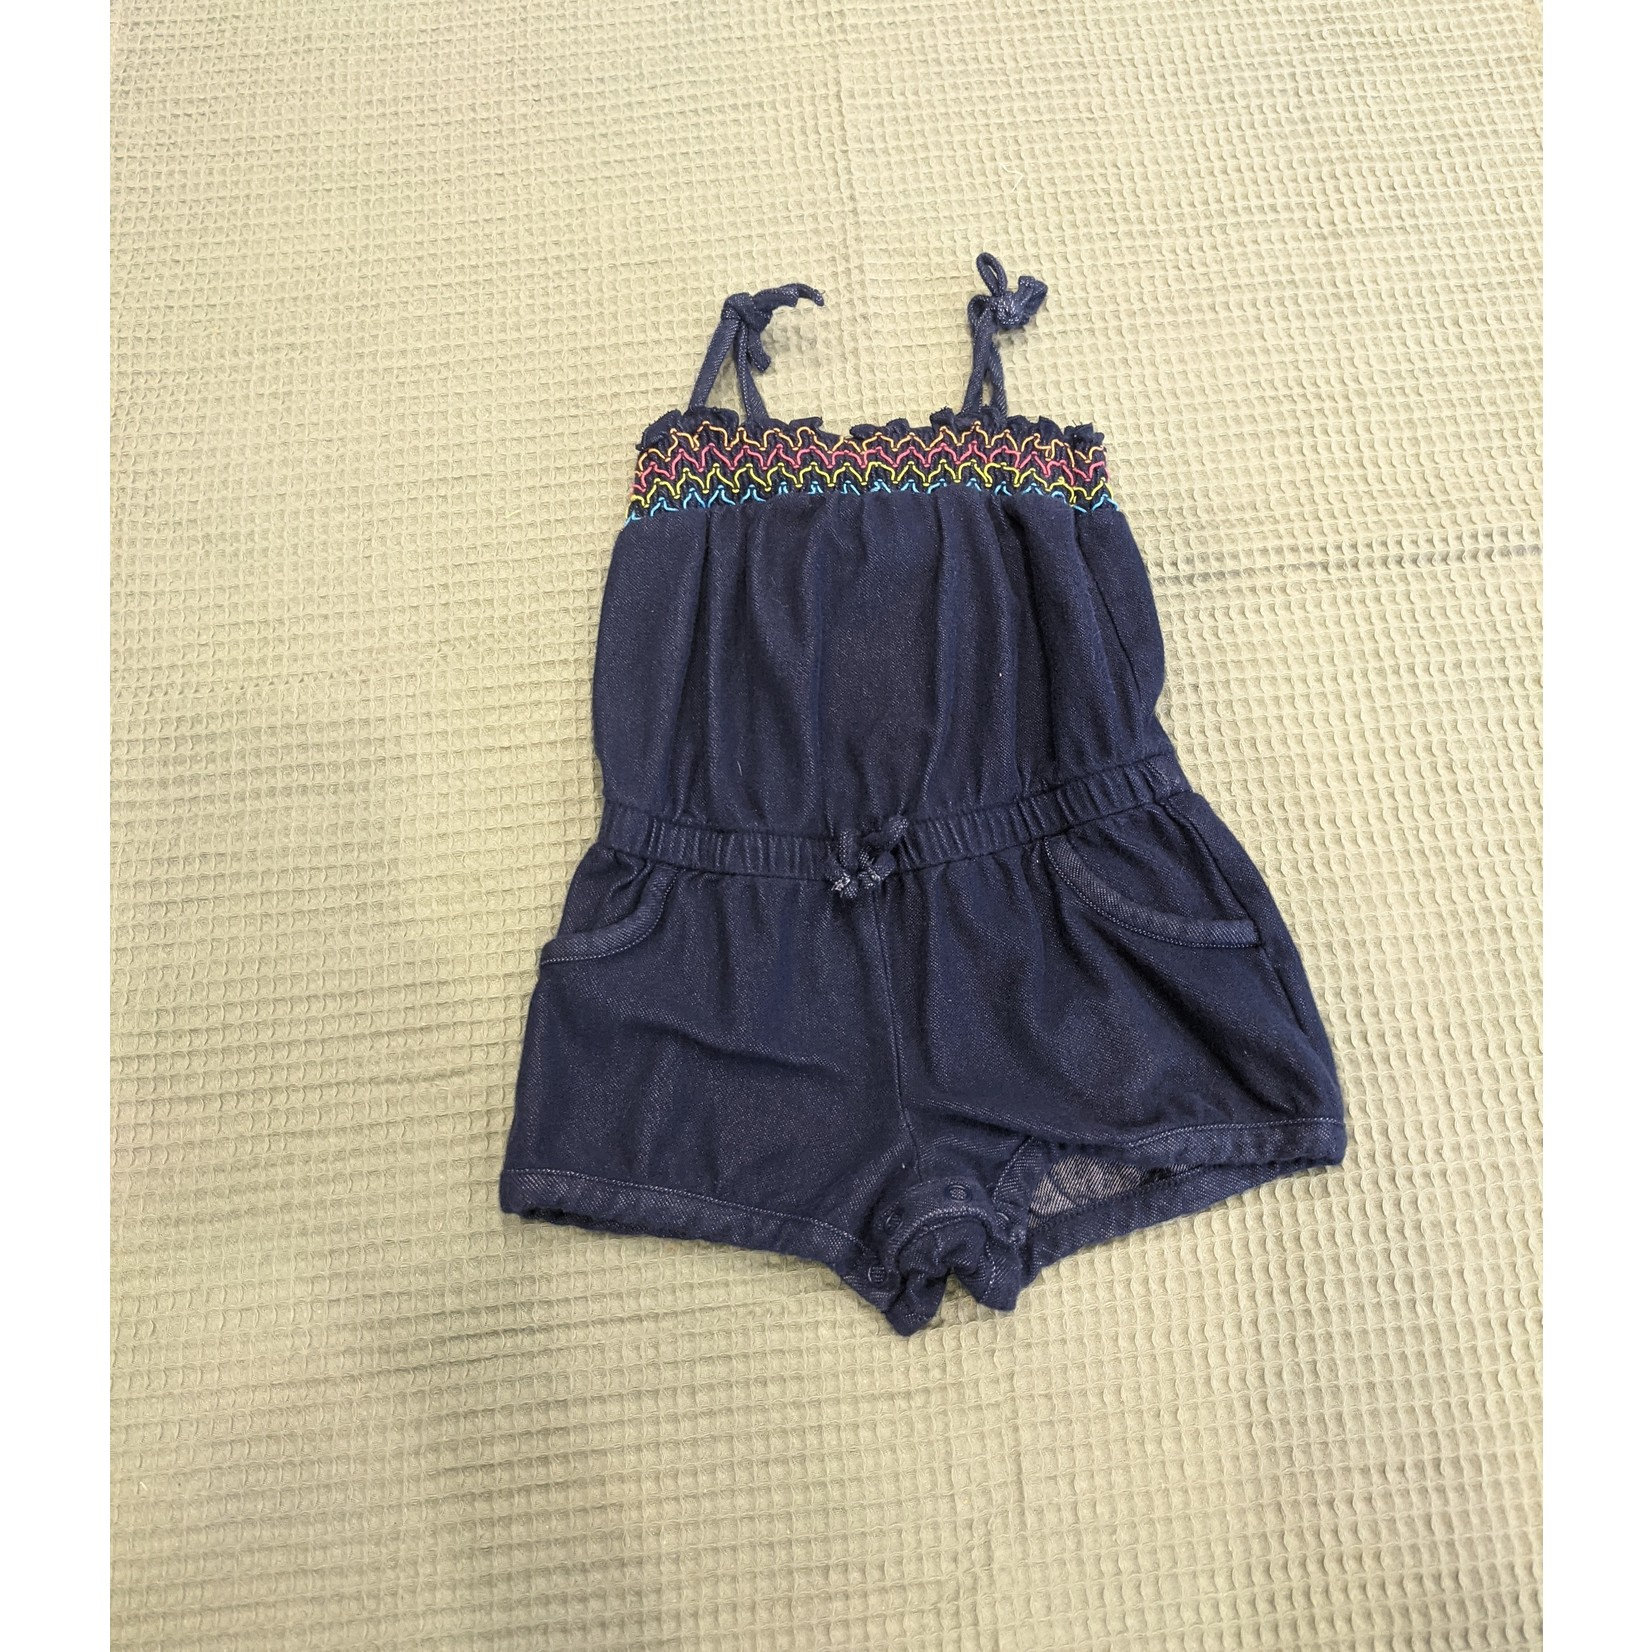 #46 One piece short imitation jeans